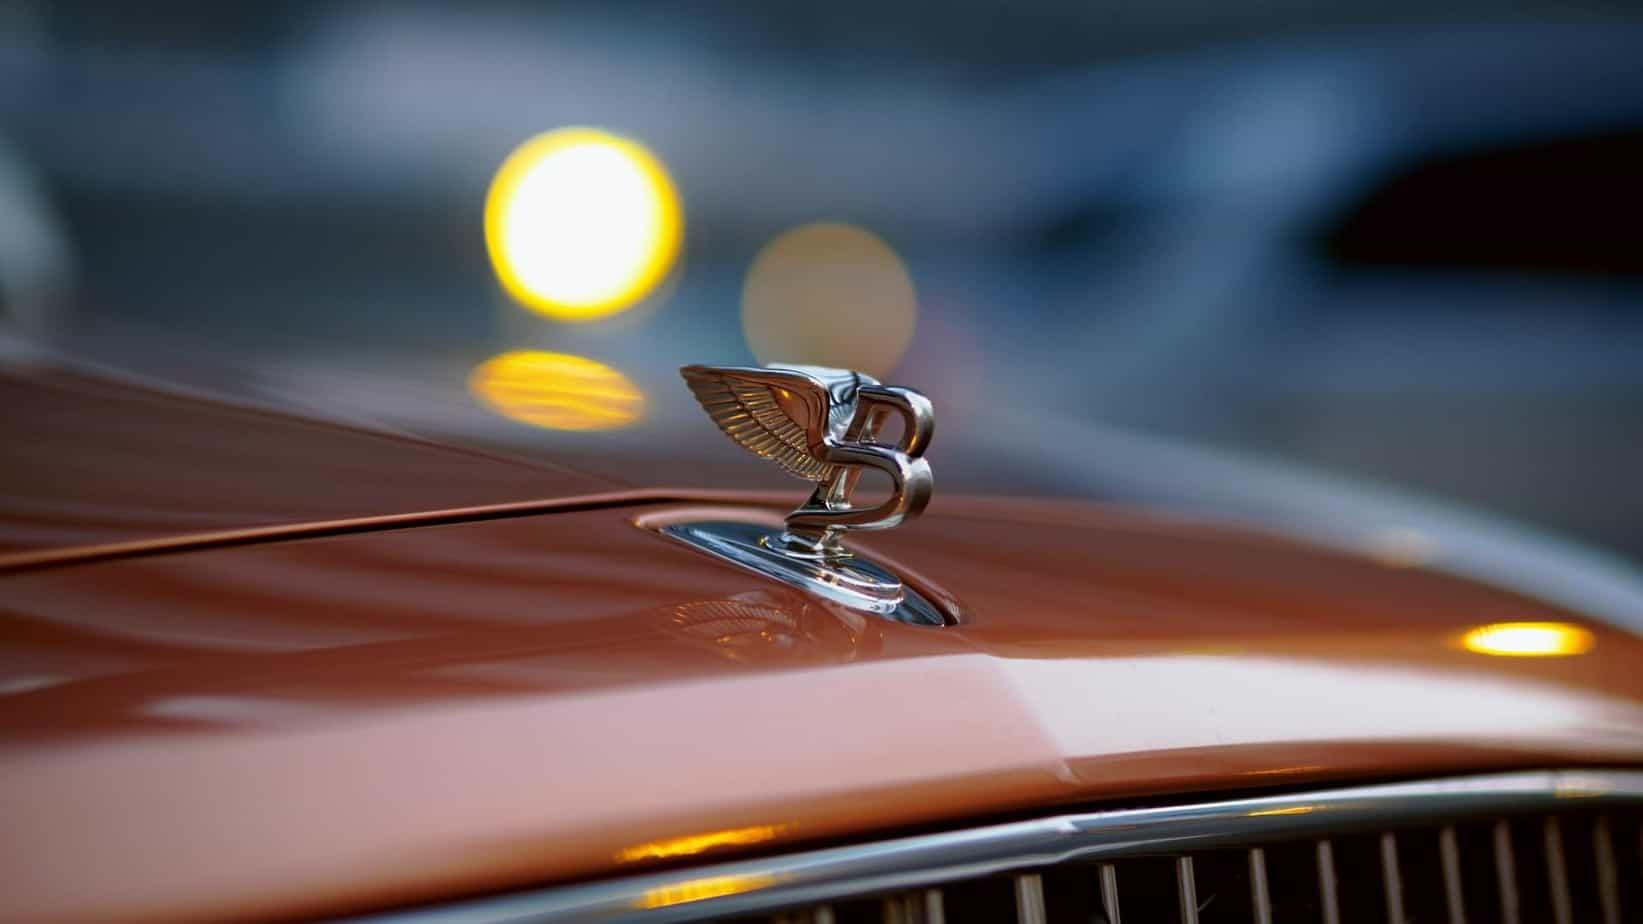 Bentley possède un deuxième véhicule hybride en préparation